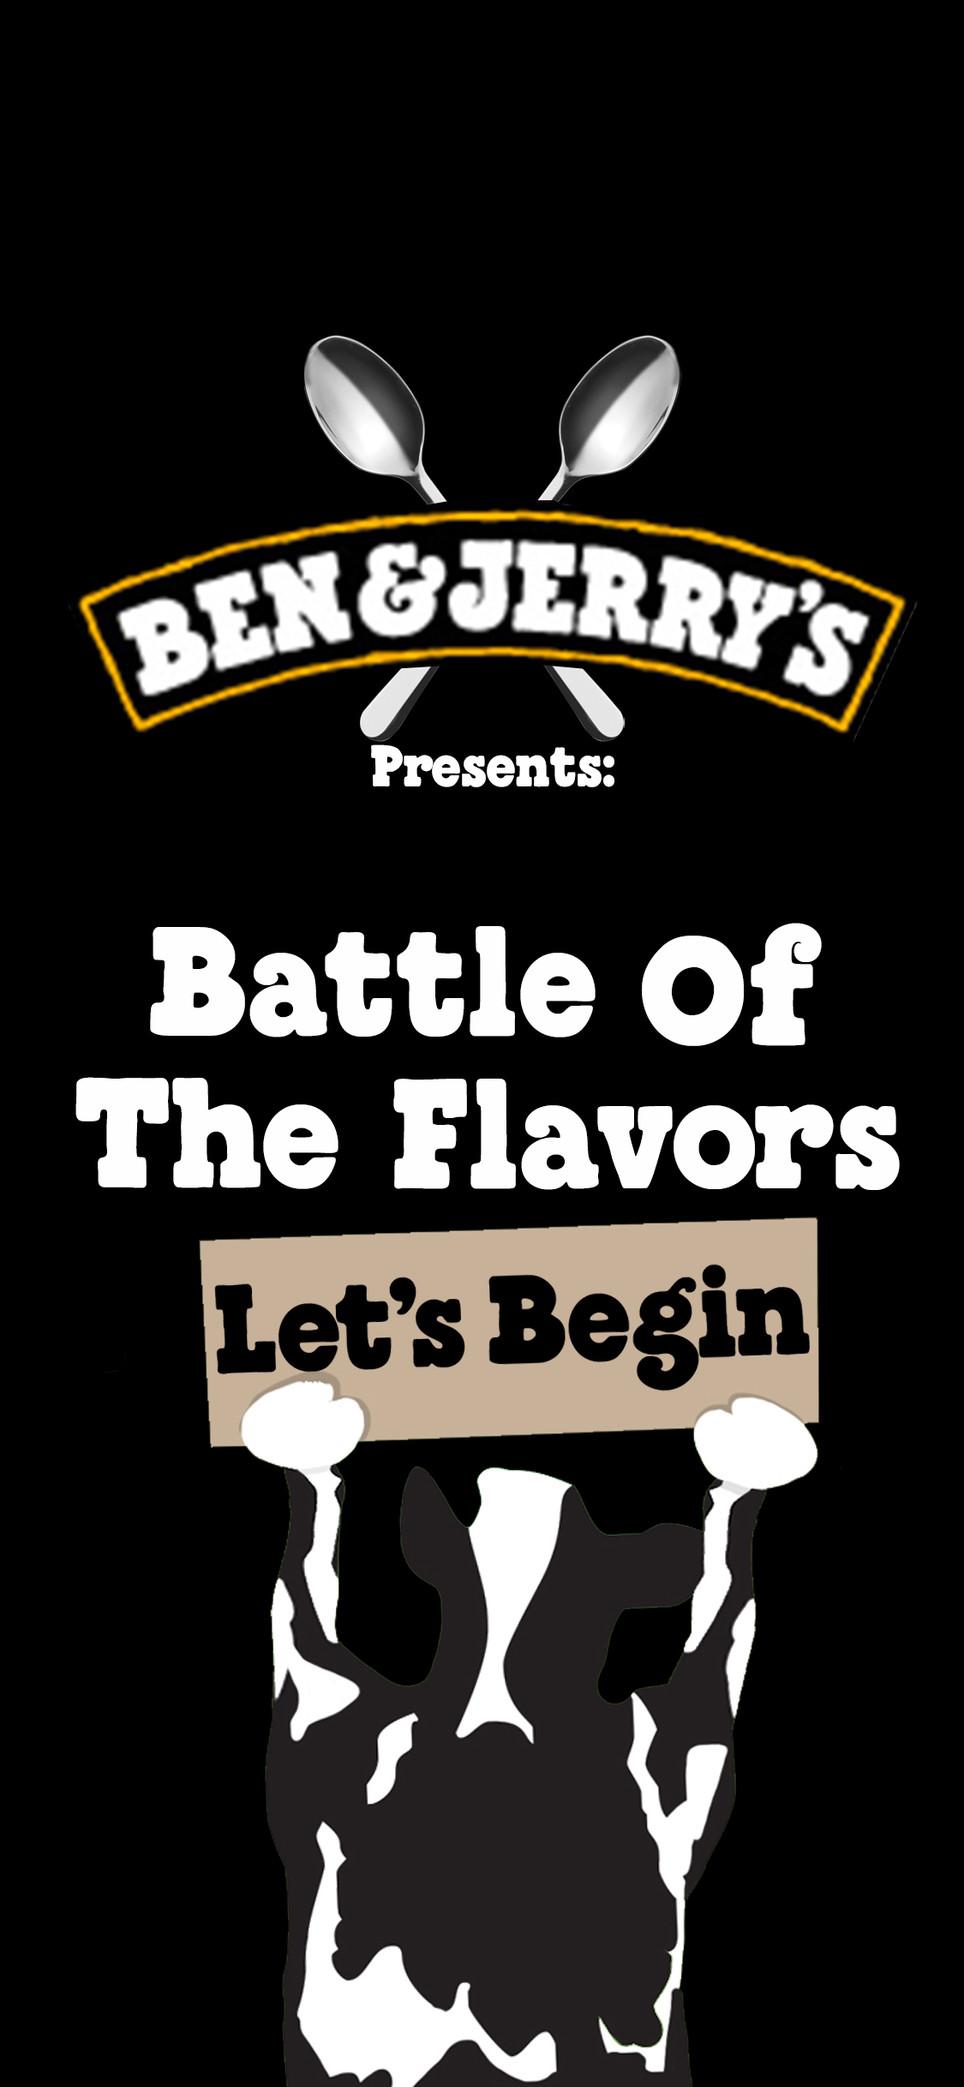 Battle of the flavors. Social Media